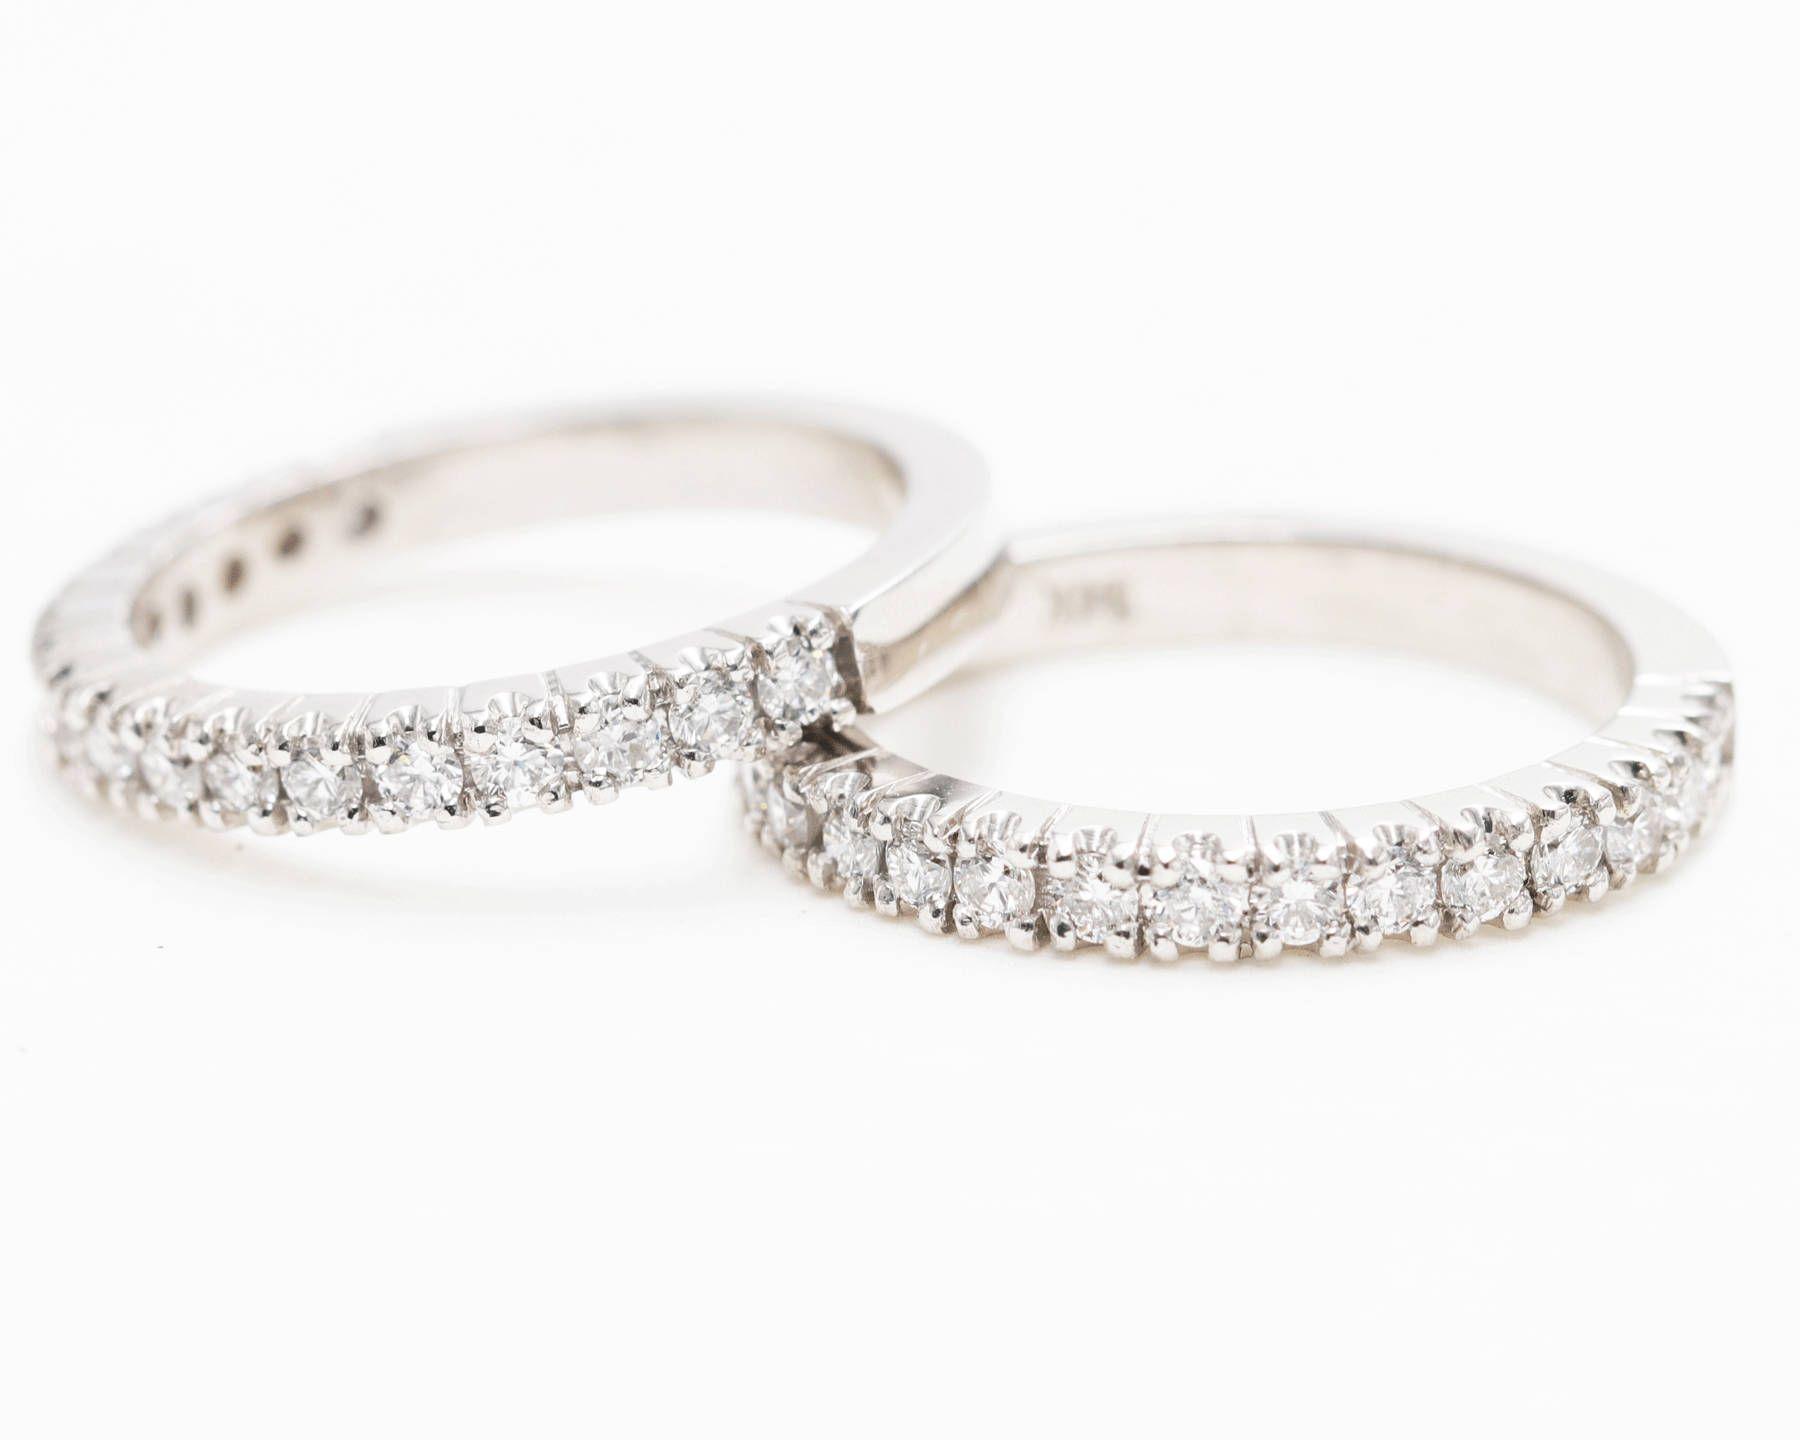 High Quality Diamond Double Row Wedding Band Engagement Ring Etsy Diamond Wedding Bands Quality Diamonds Diamond Bands